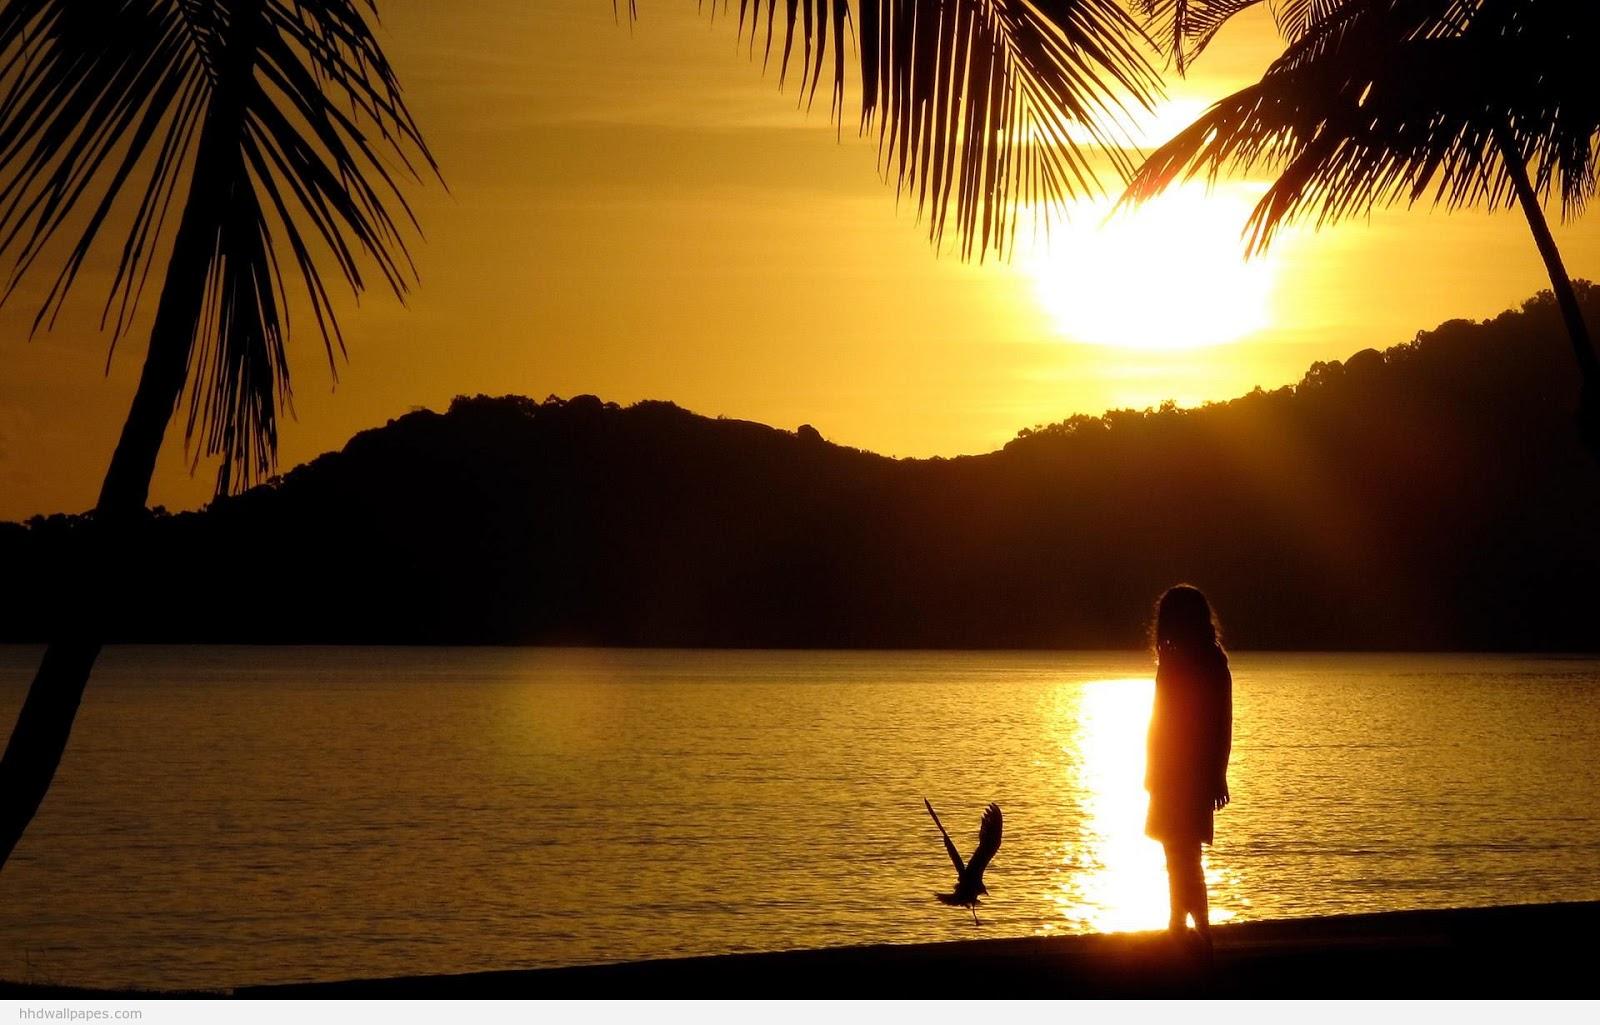 A Sunset Scene Image